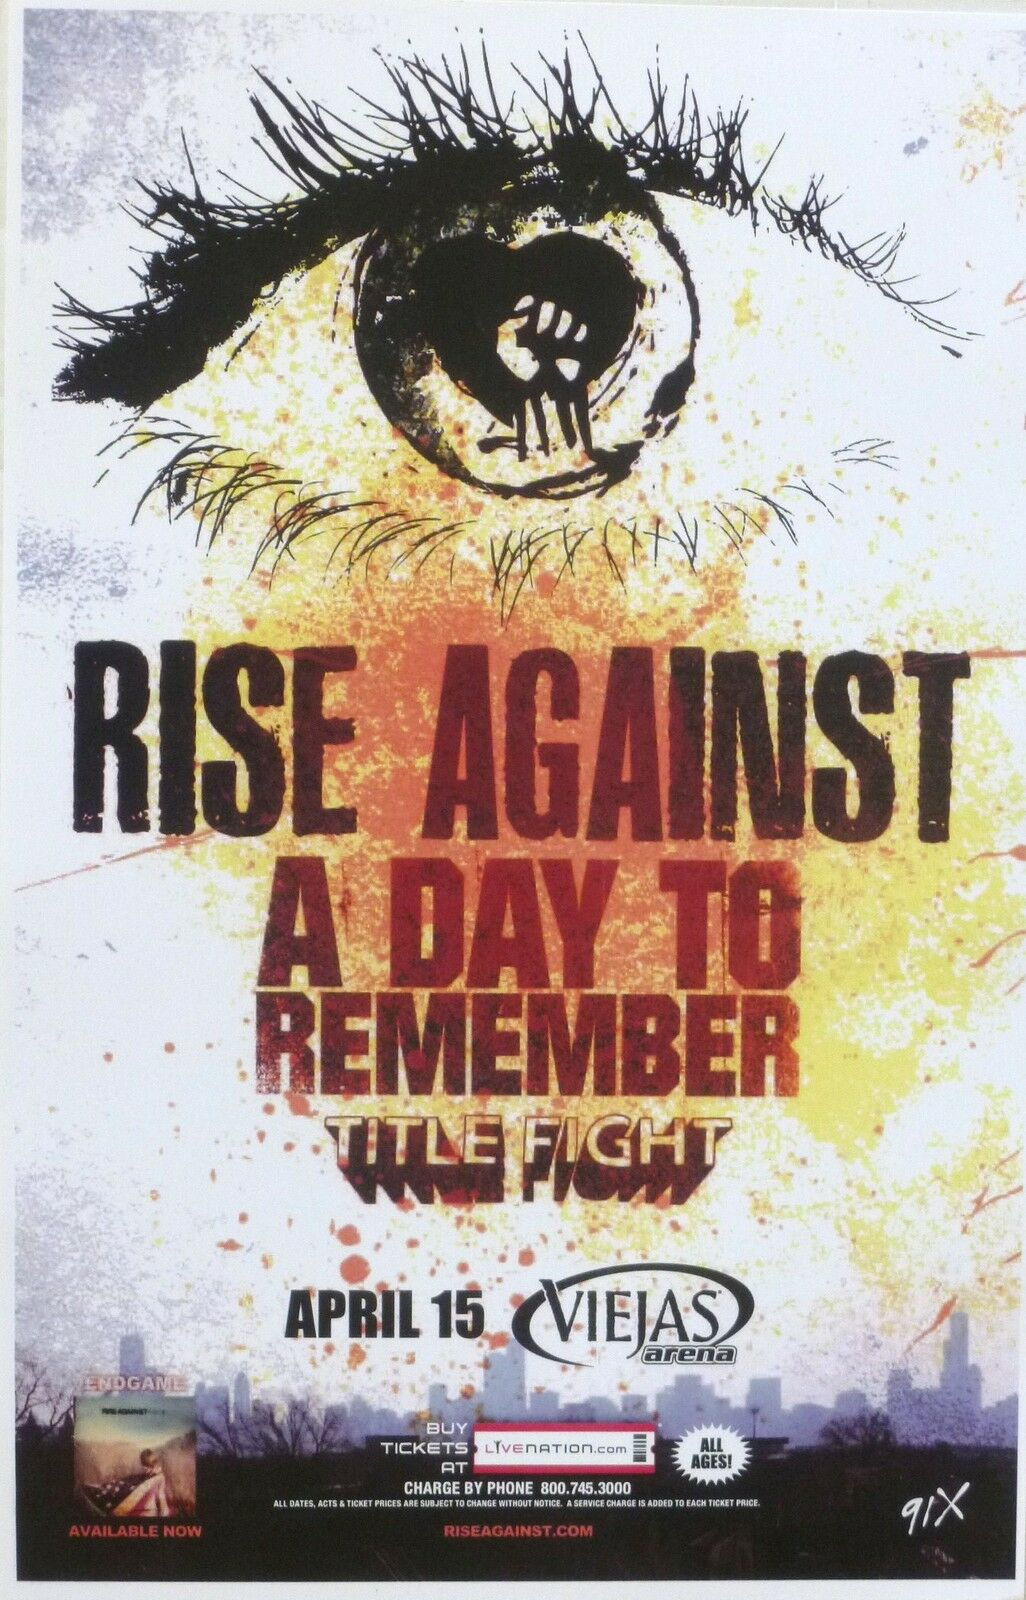 rise against a day to remember 2012 san diego concert tour poster punk rock ebay. Black Bedroom Furniture Sets. Home Design Ideas